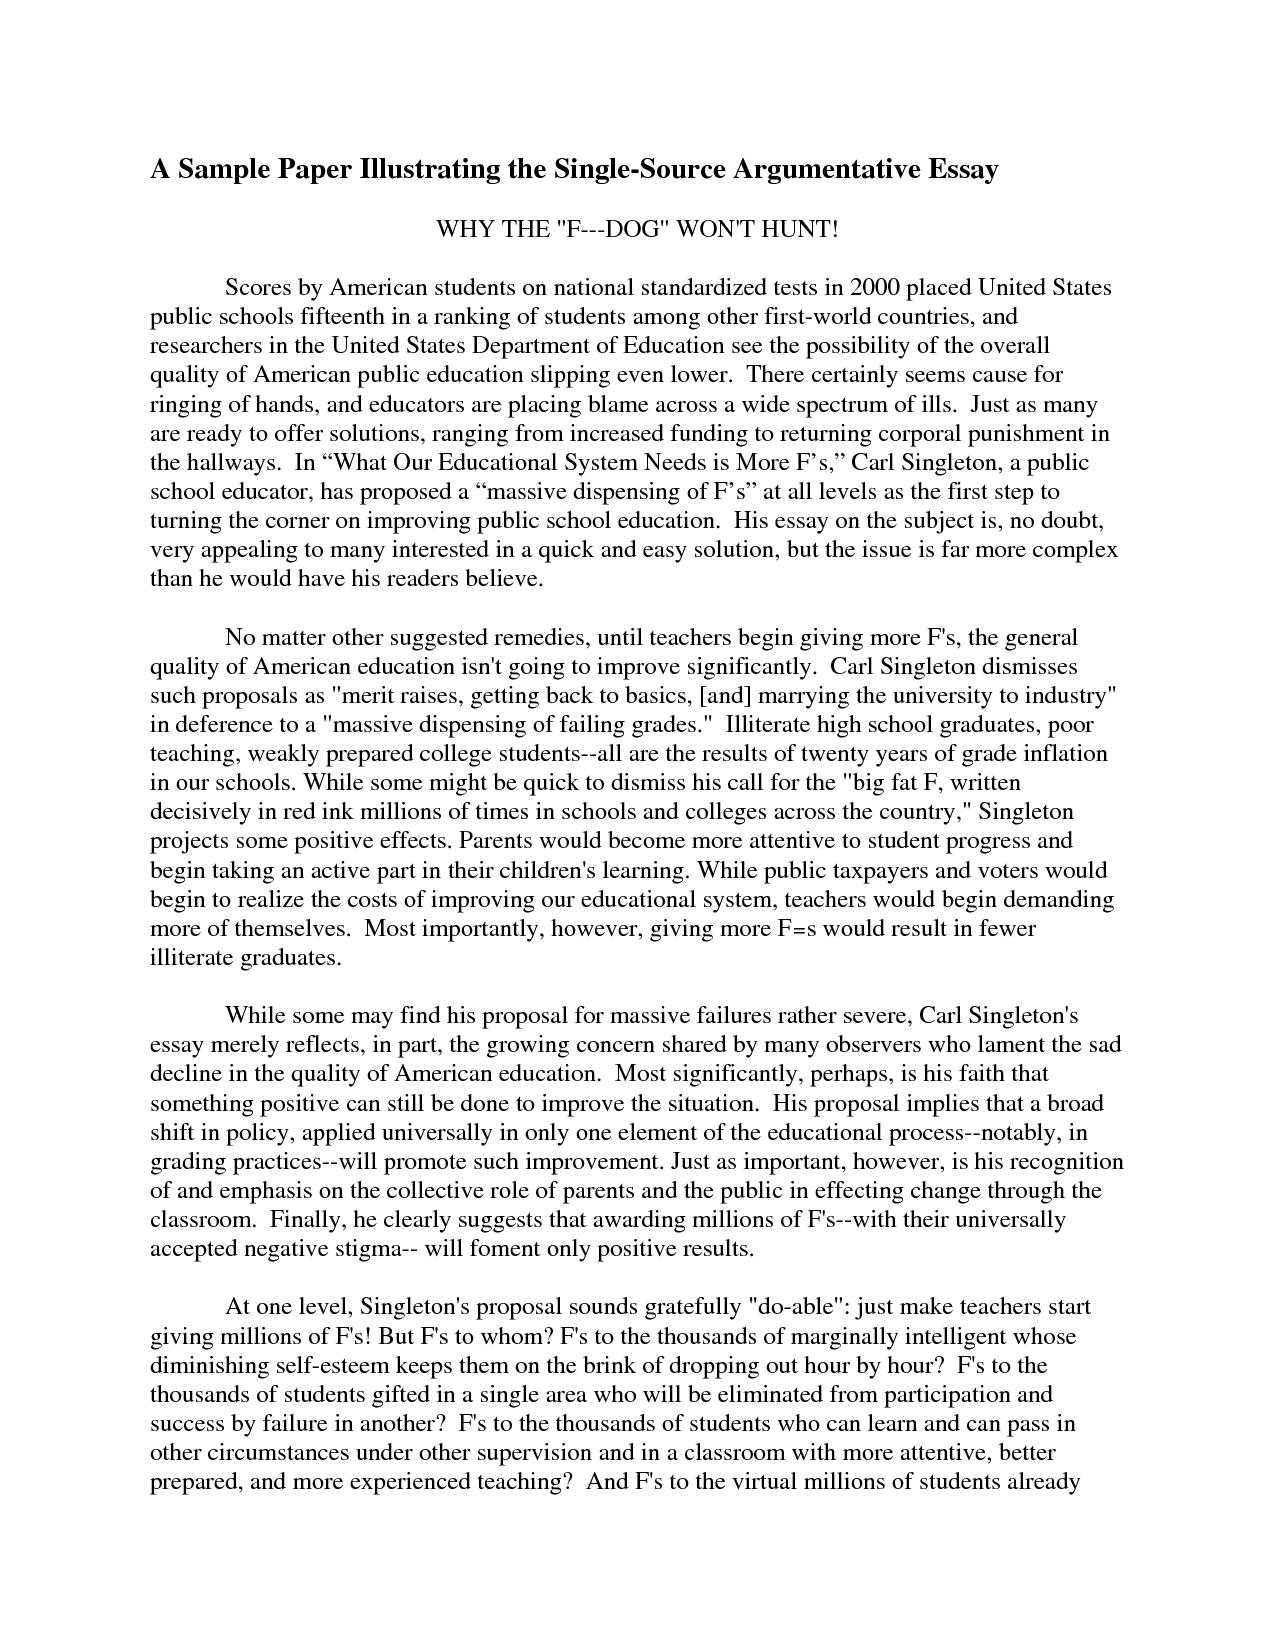 011 Argumentative Essays For High School Fyvb2pmxix Striking Essay Examples Short Topics Full